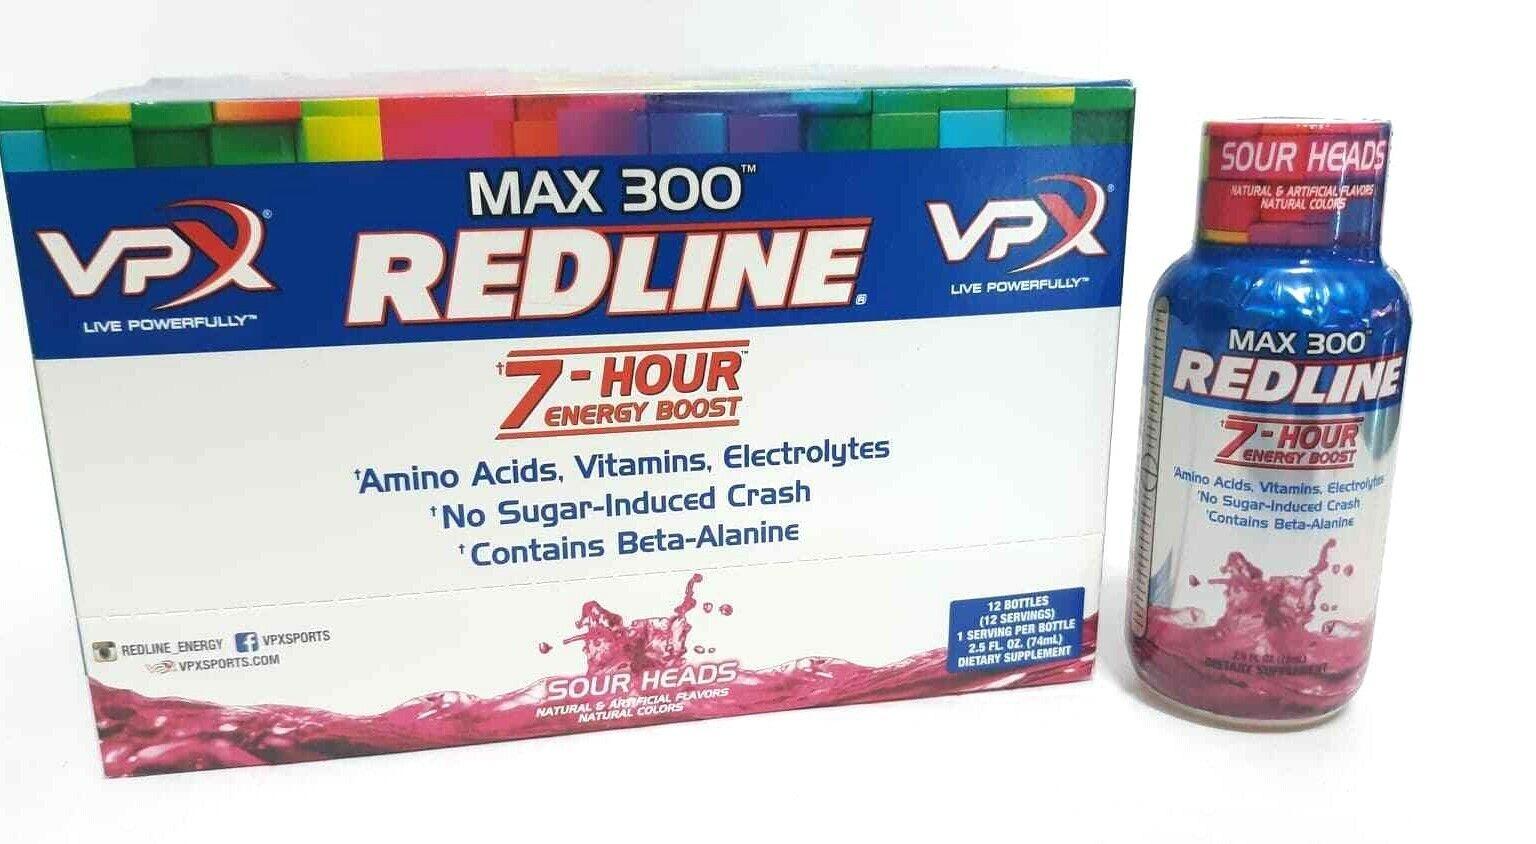 VPX Redline Power Rush 7-Hour Energy Max 300 Supplement, 2.5oz (Select Flavor)